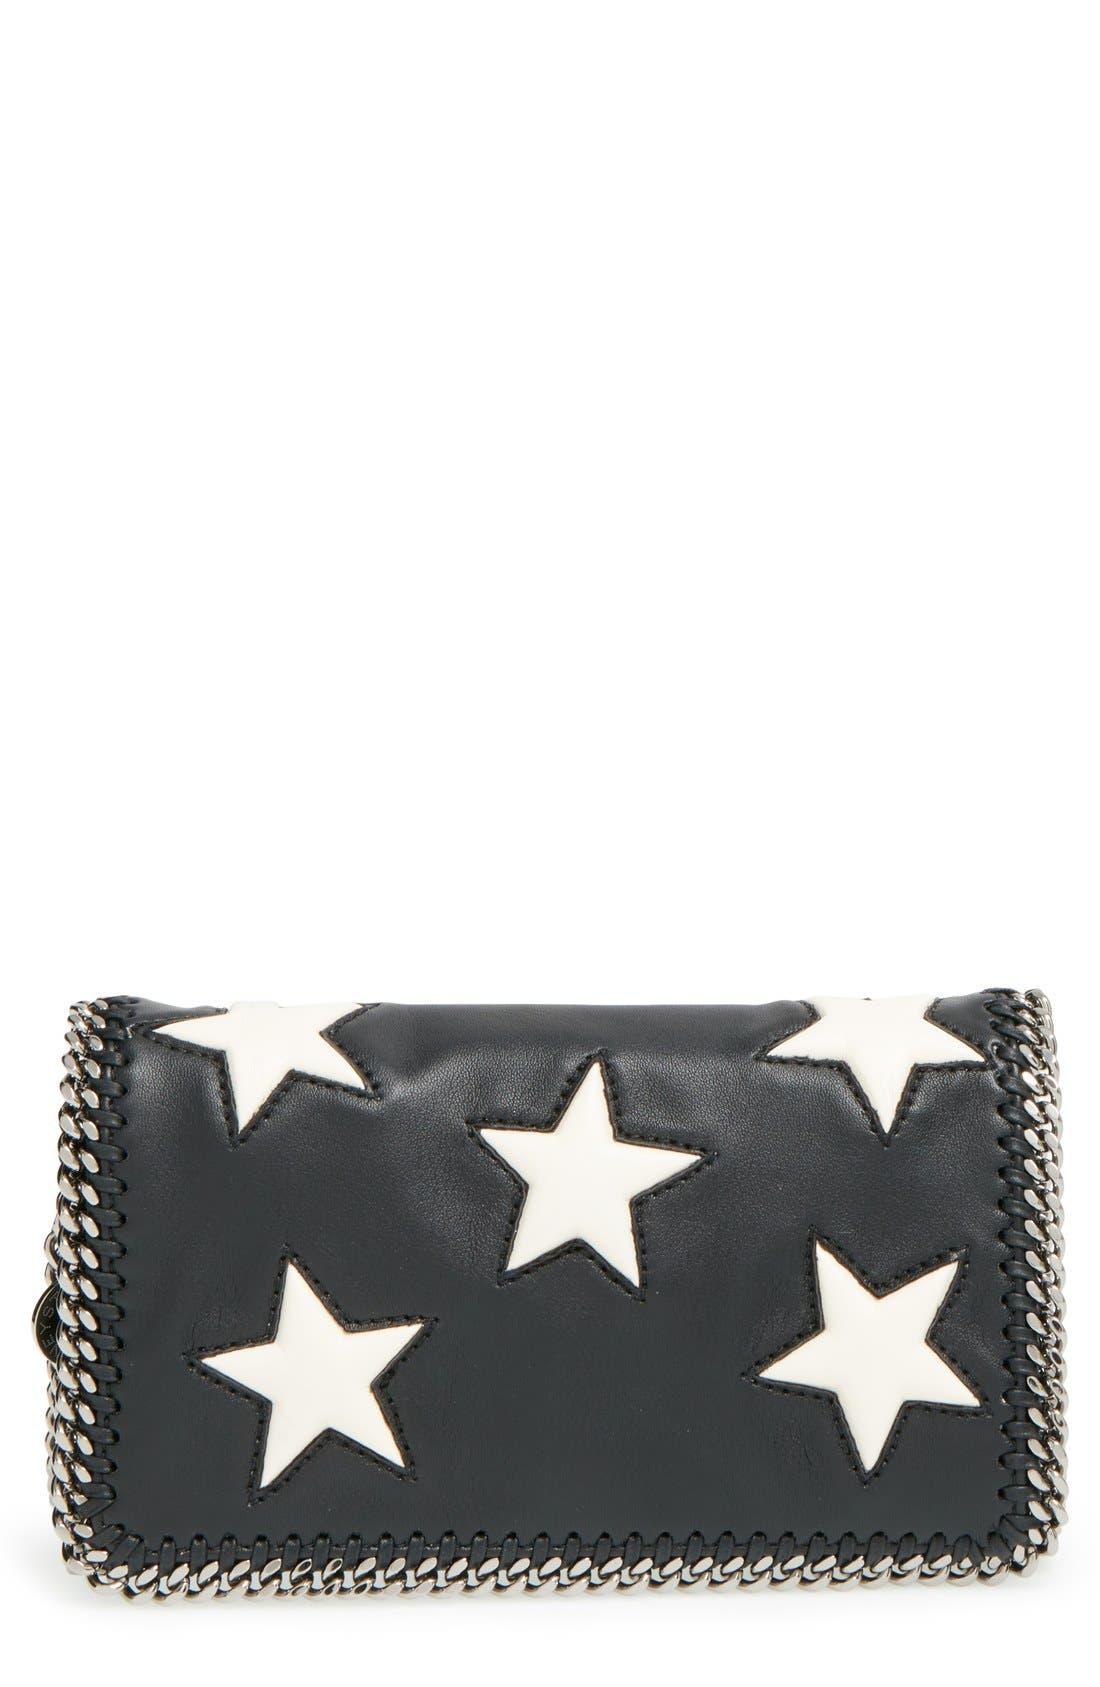 Main Image - Stella McCartney 'Falabella' Faux Leather Crossbody Bag